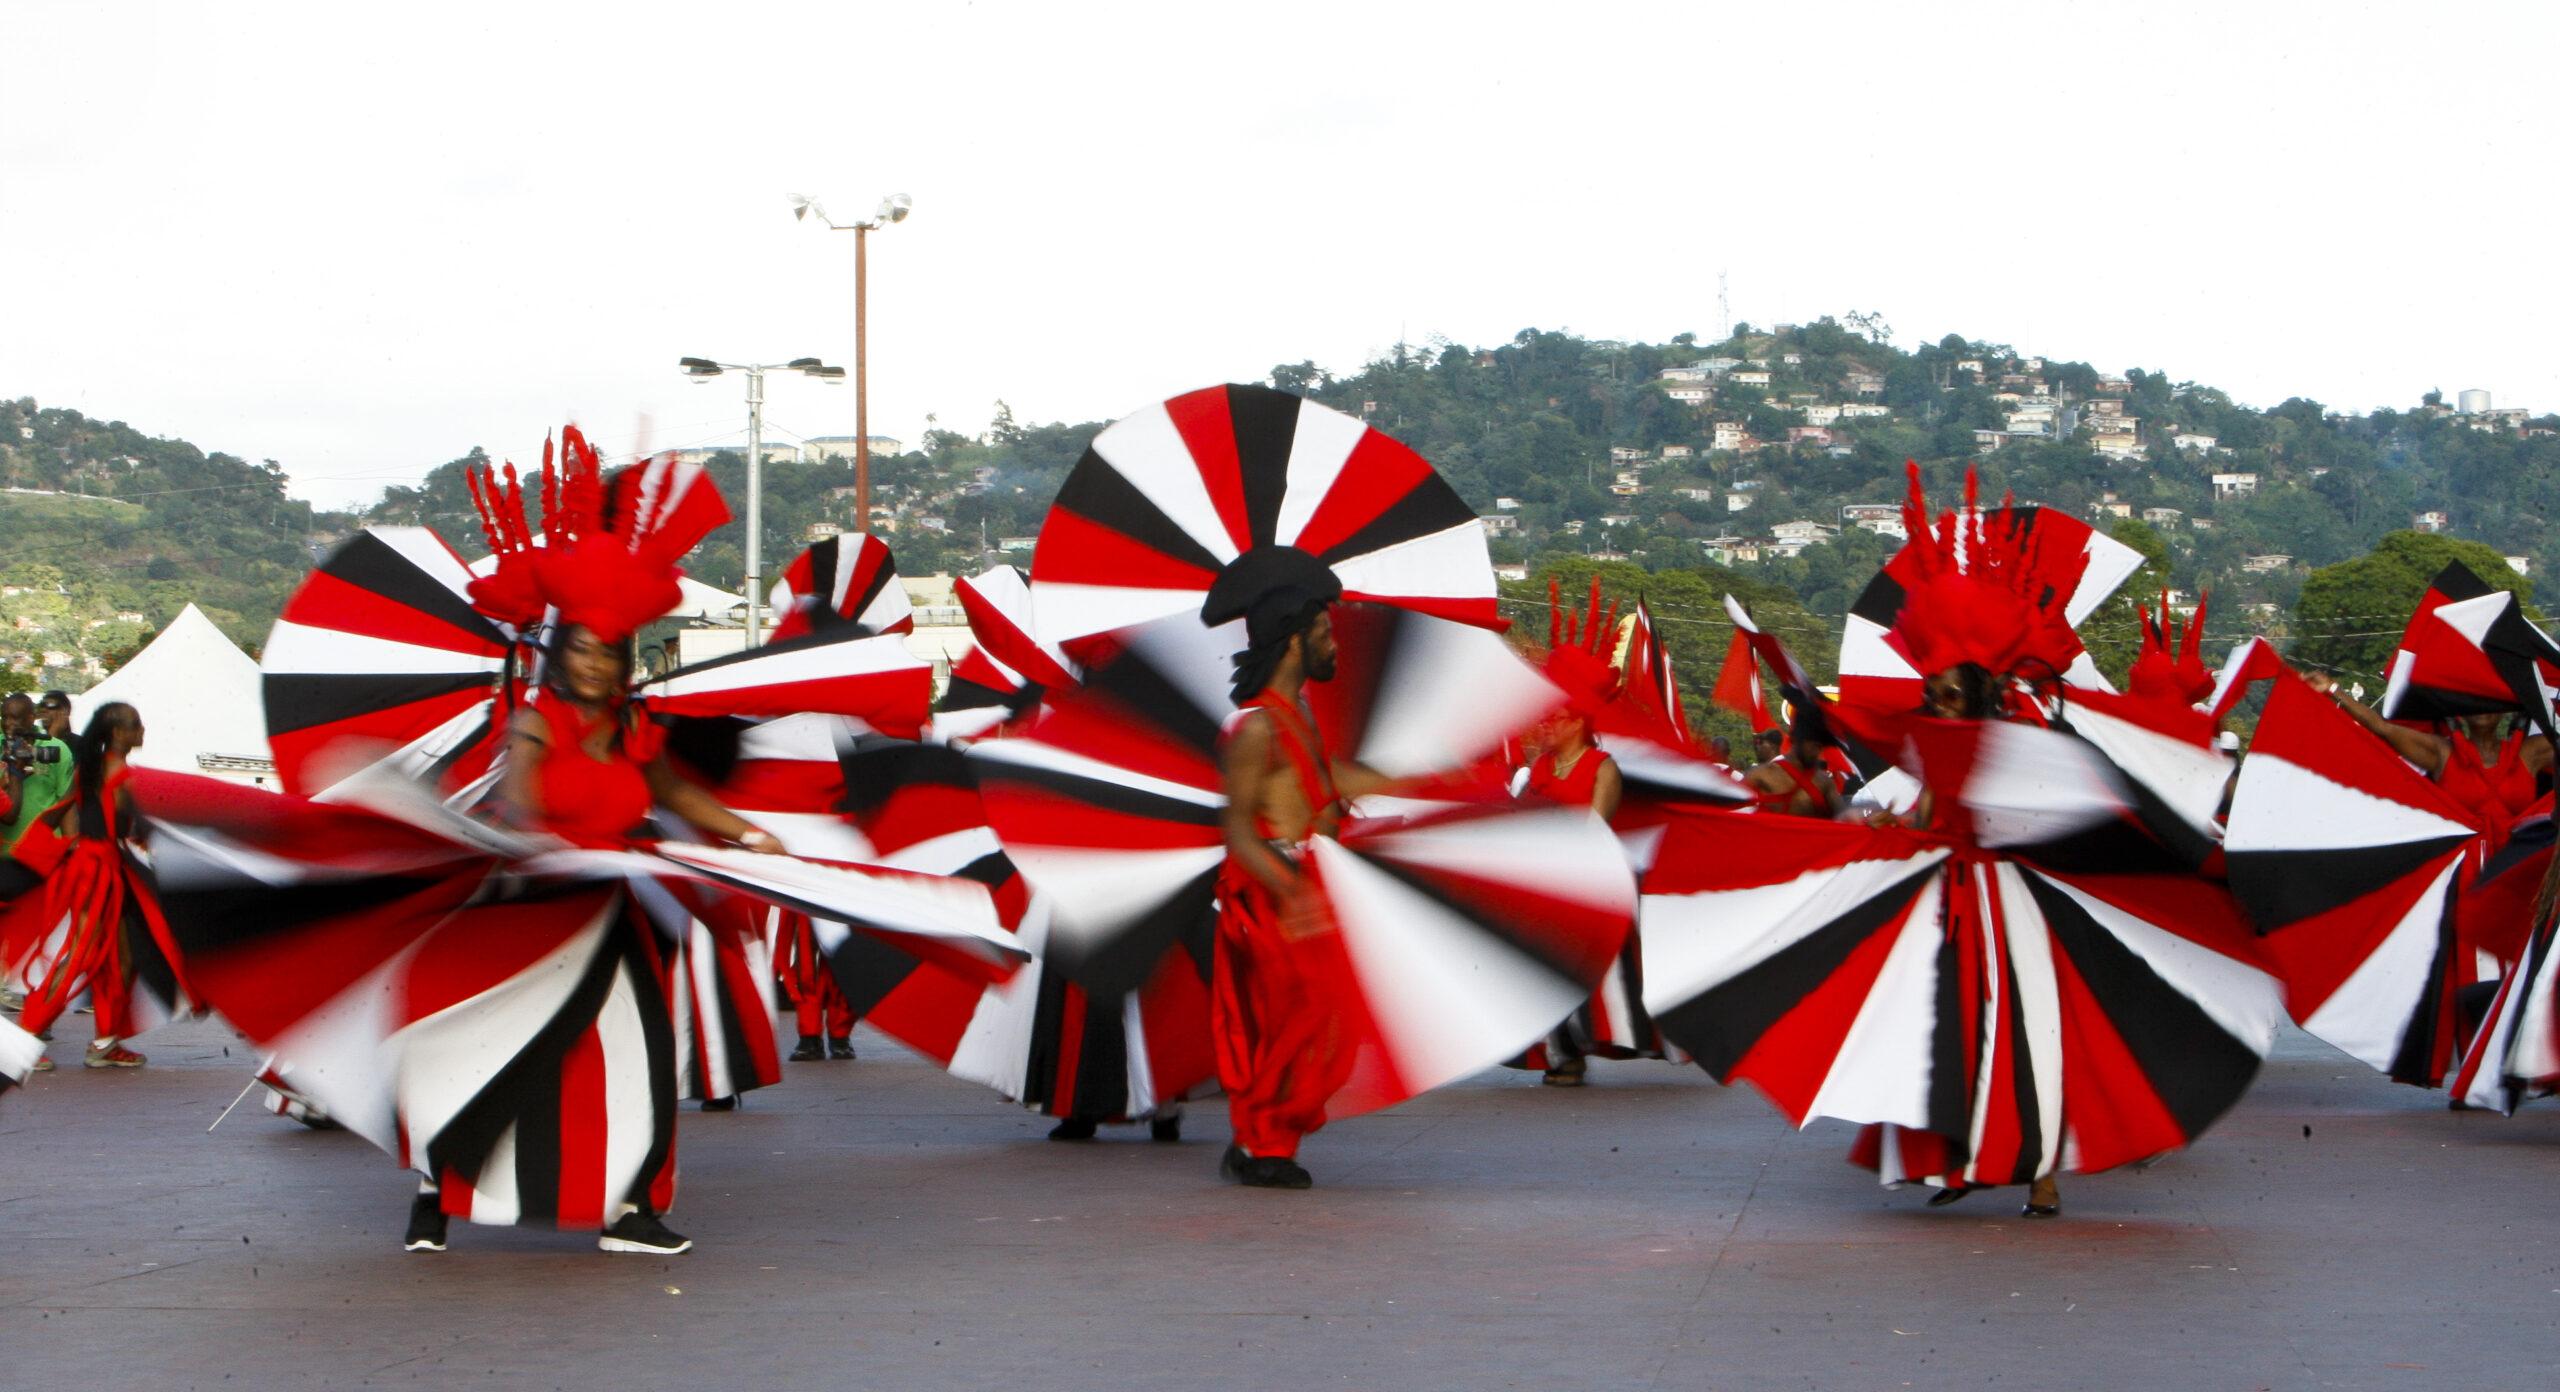 Trinidad Christmas Regga Music 2021 20 Festivals You Must Experience In Trinidad Tobago Destination Trinidad And Tobago Tours Holidays Vacations And Travel Guide